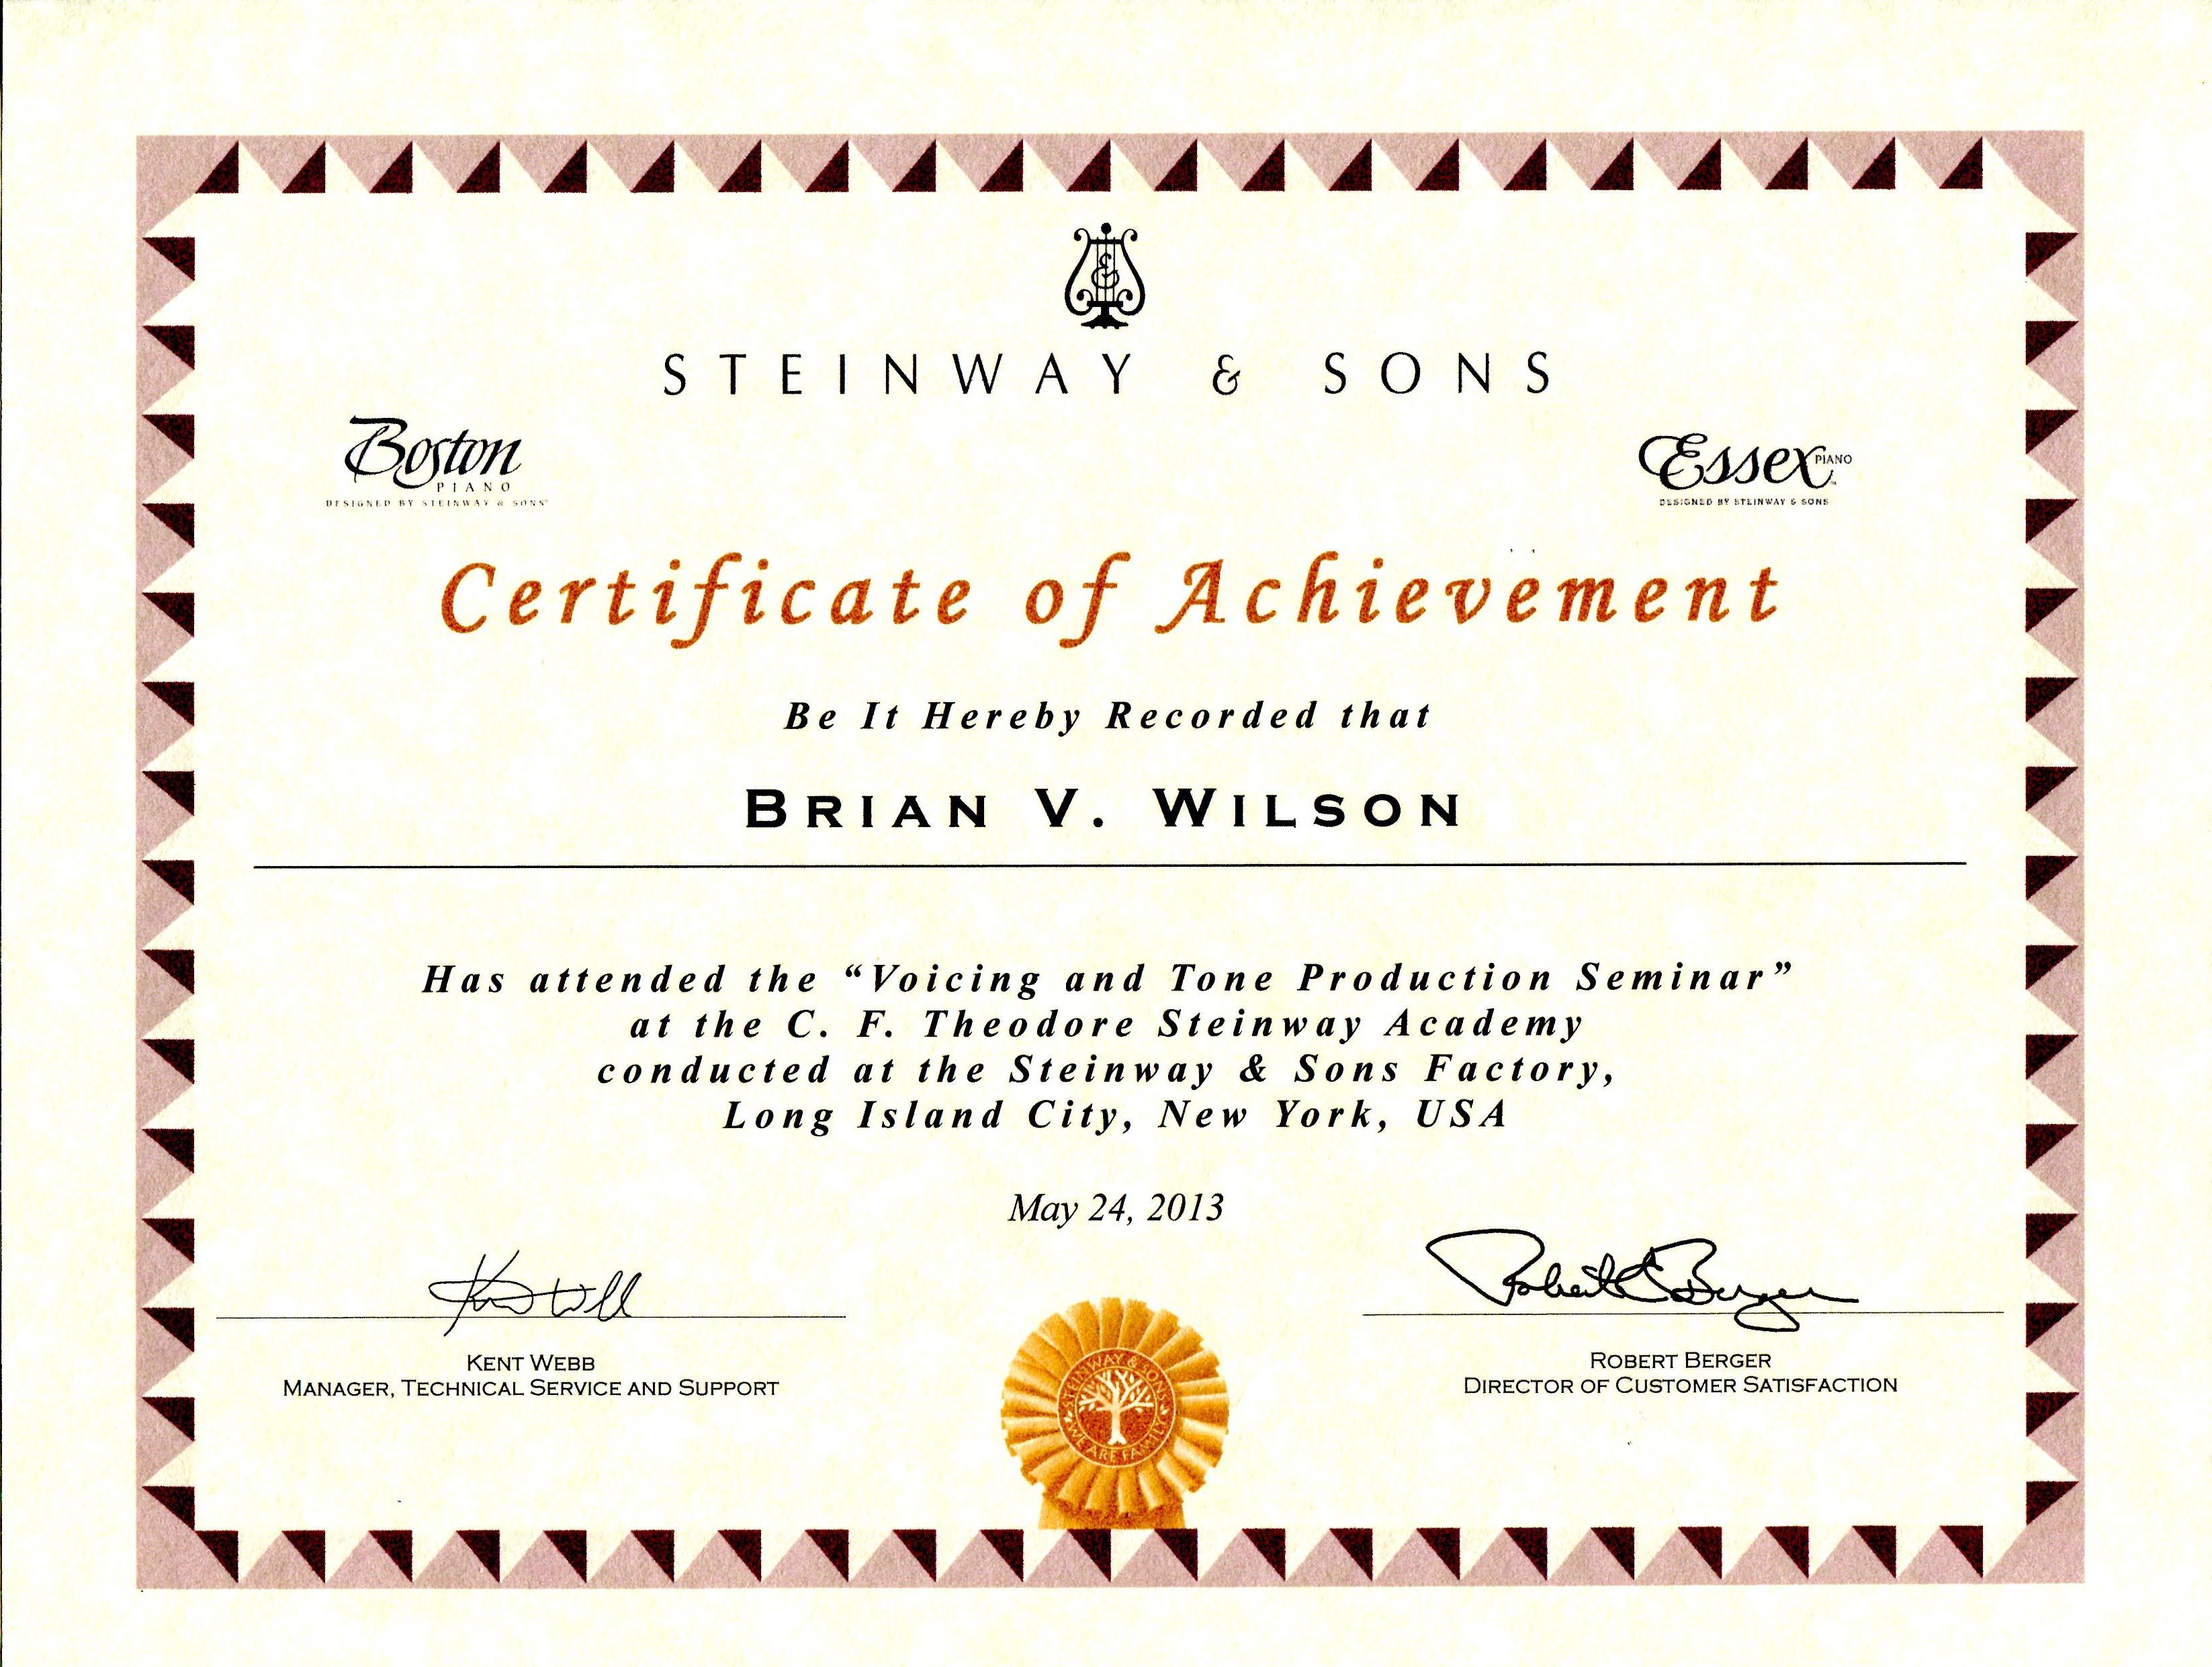 Brian Wilson - Steinway Accreditation 2012